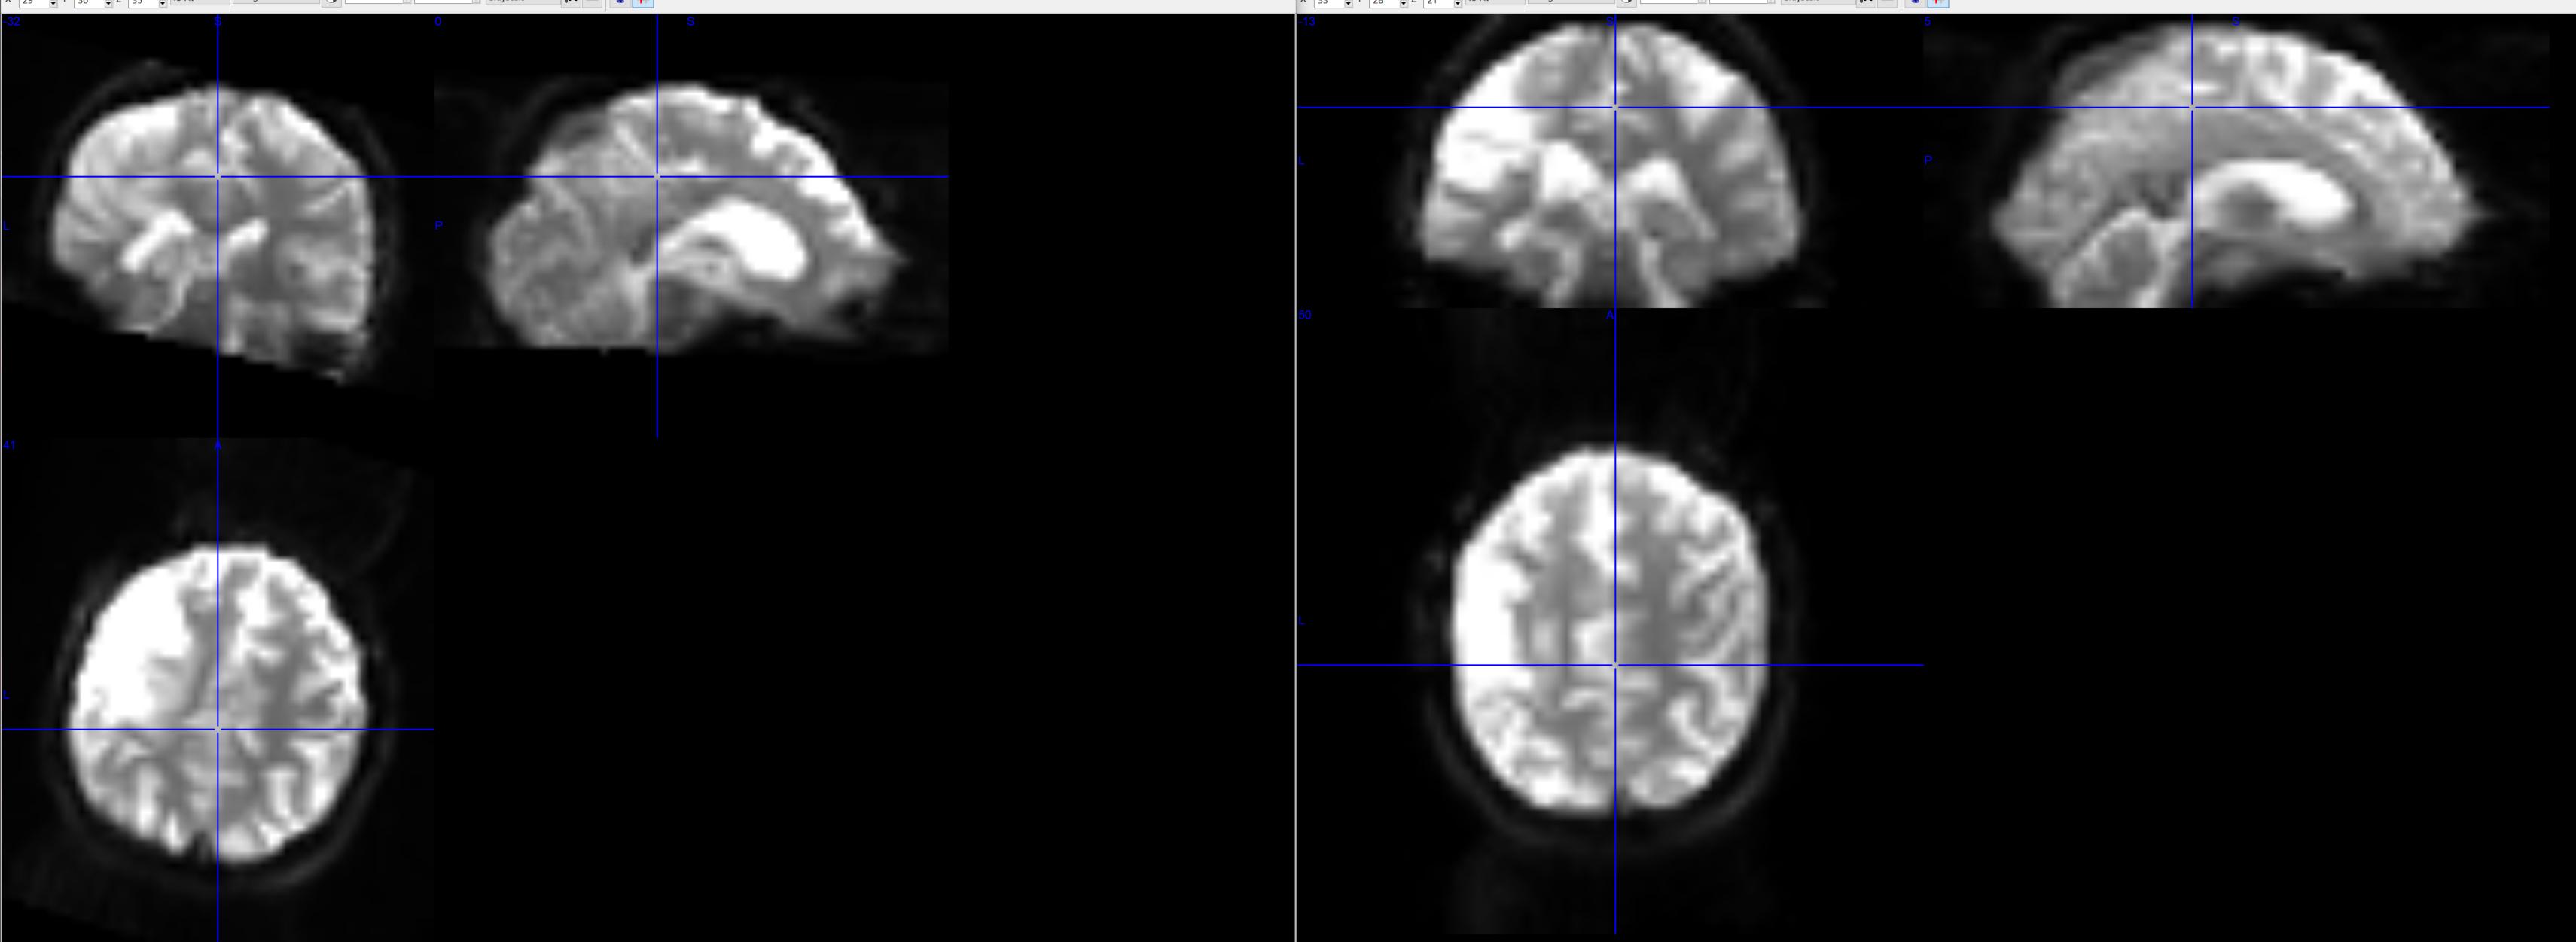 EPI to T1 registration - fmriprep - Neurostars